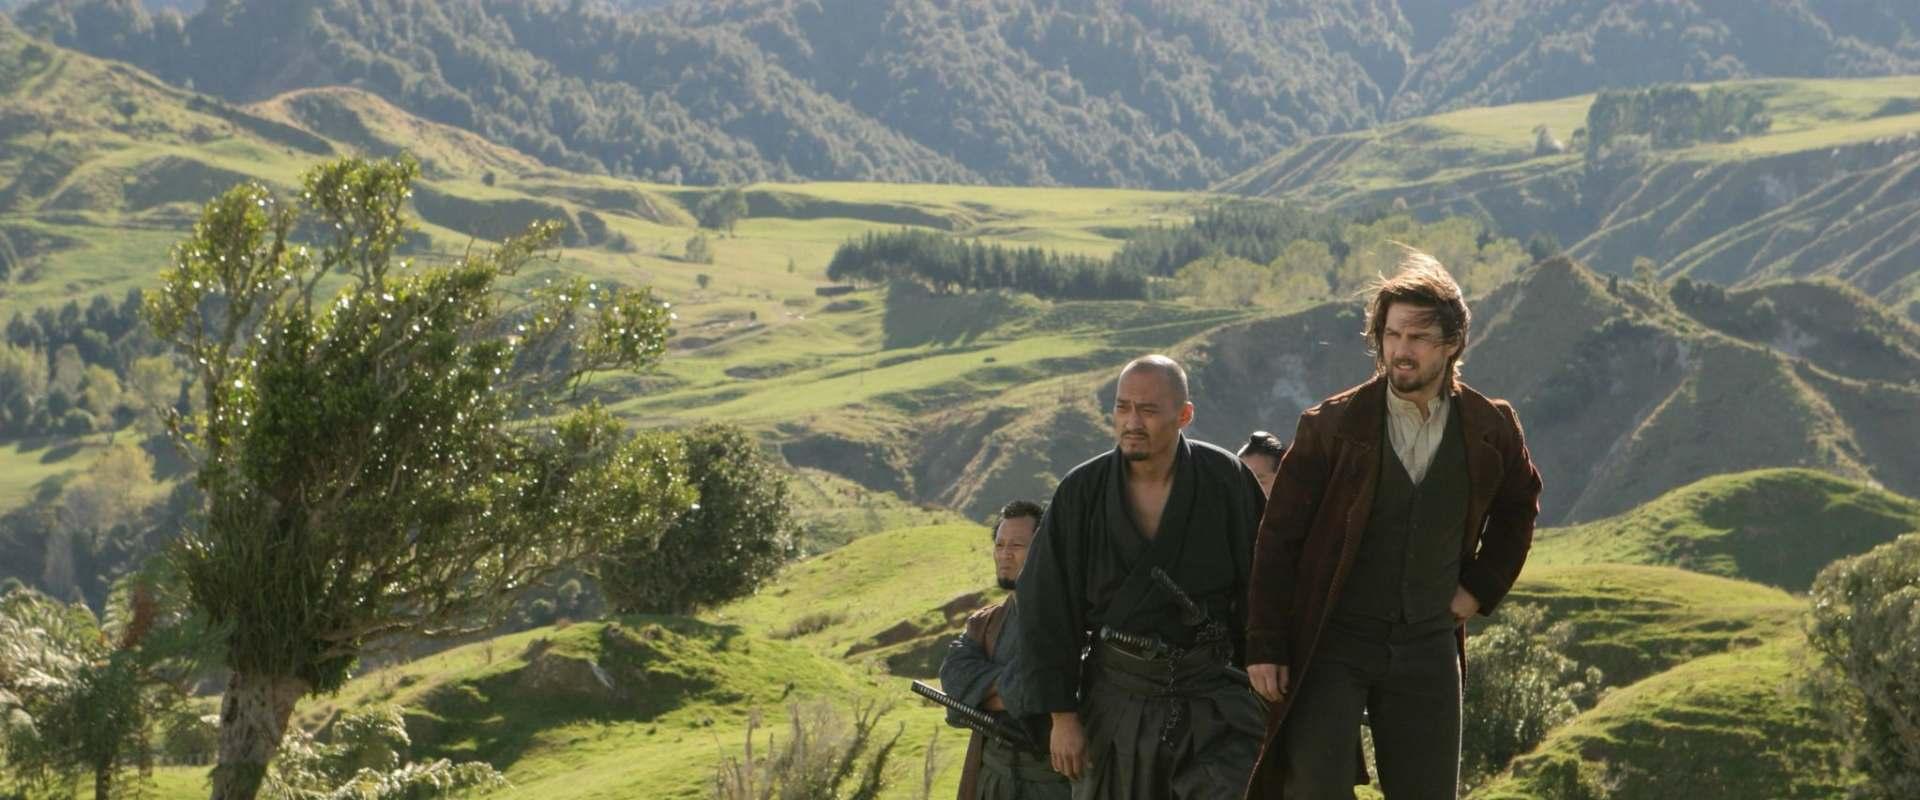 Last Samurai Netflix